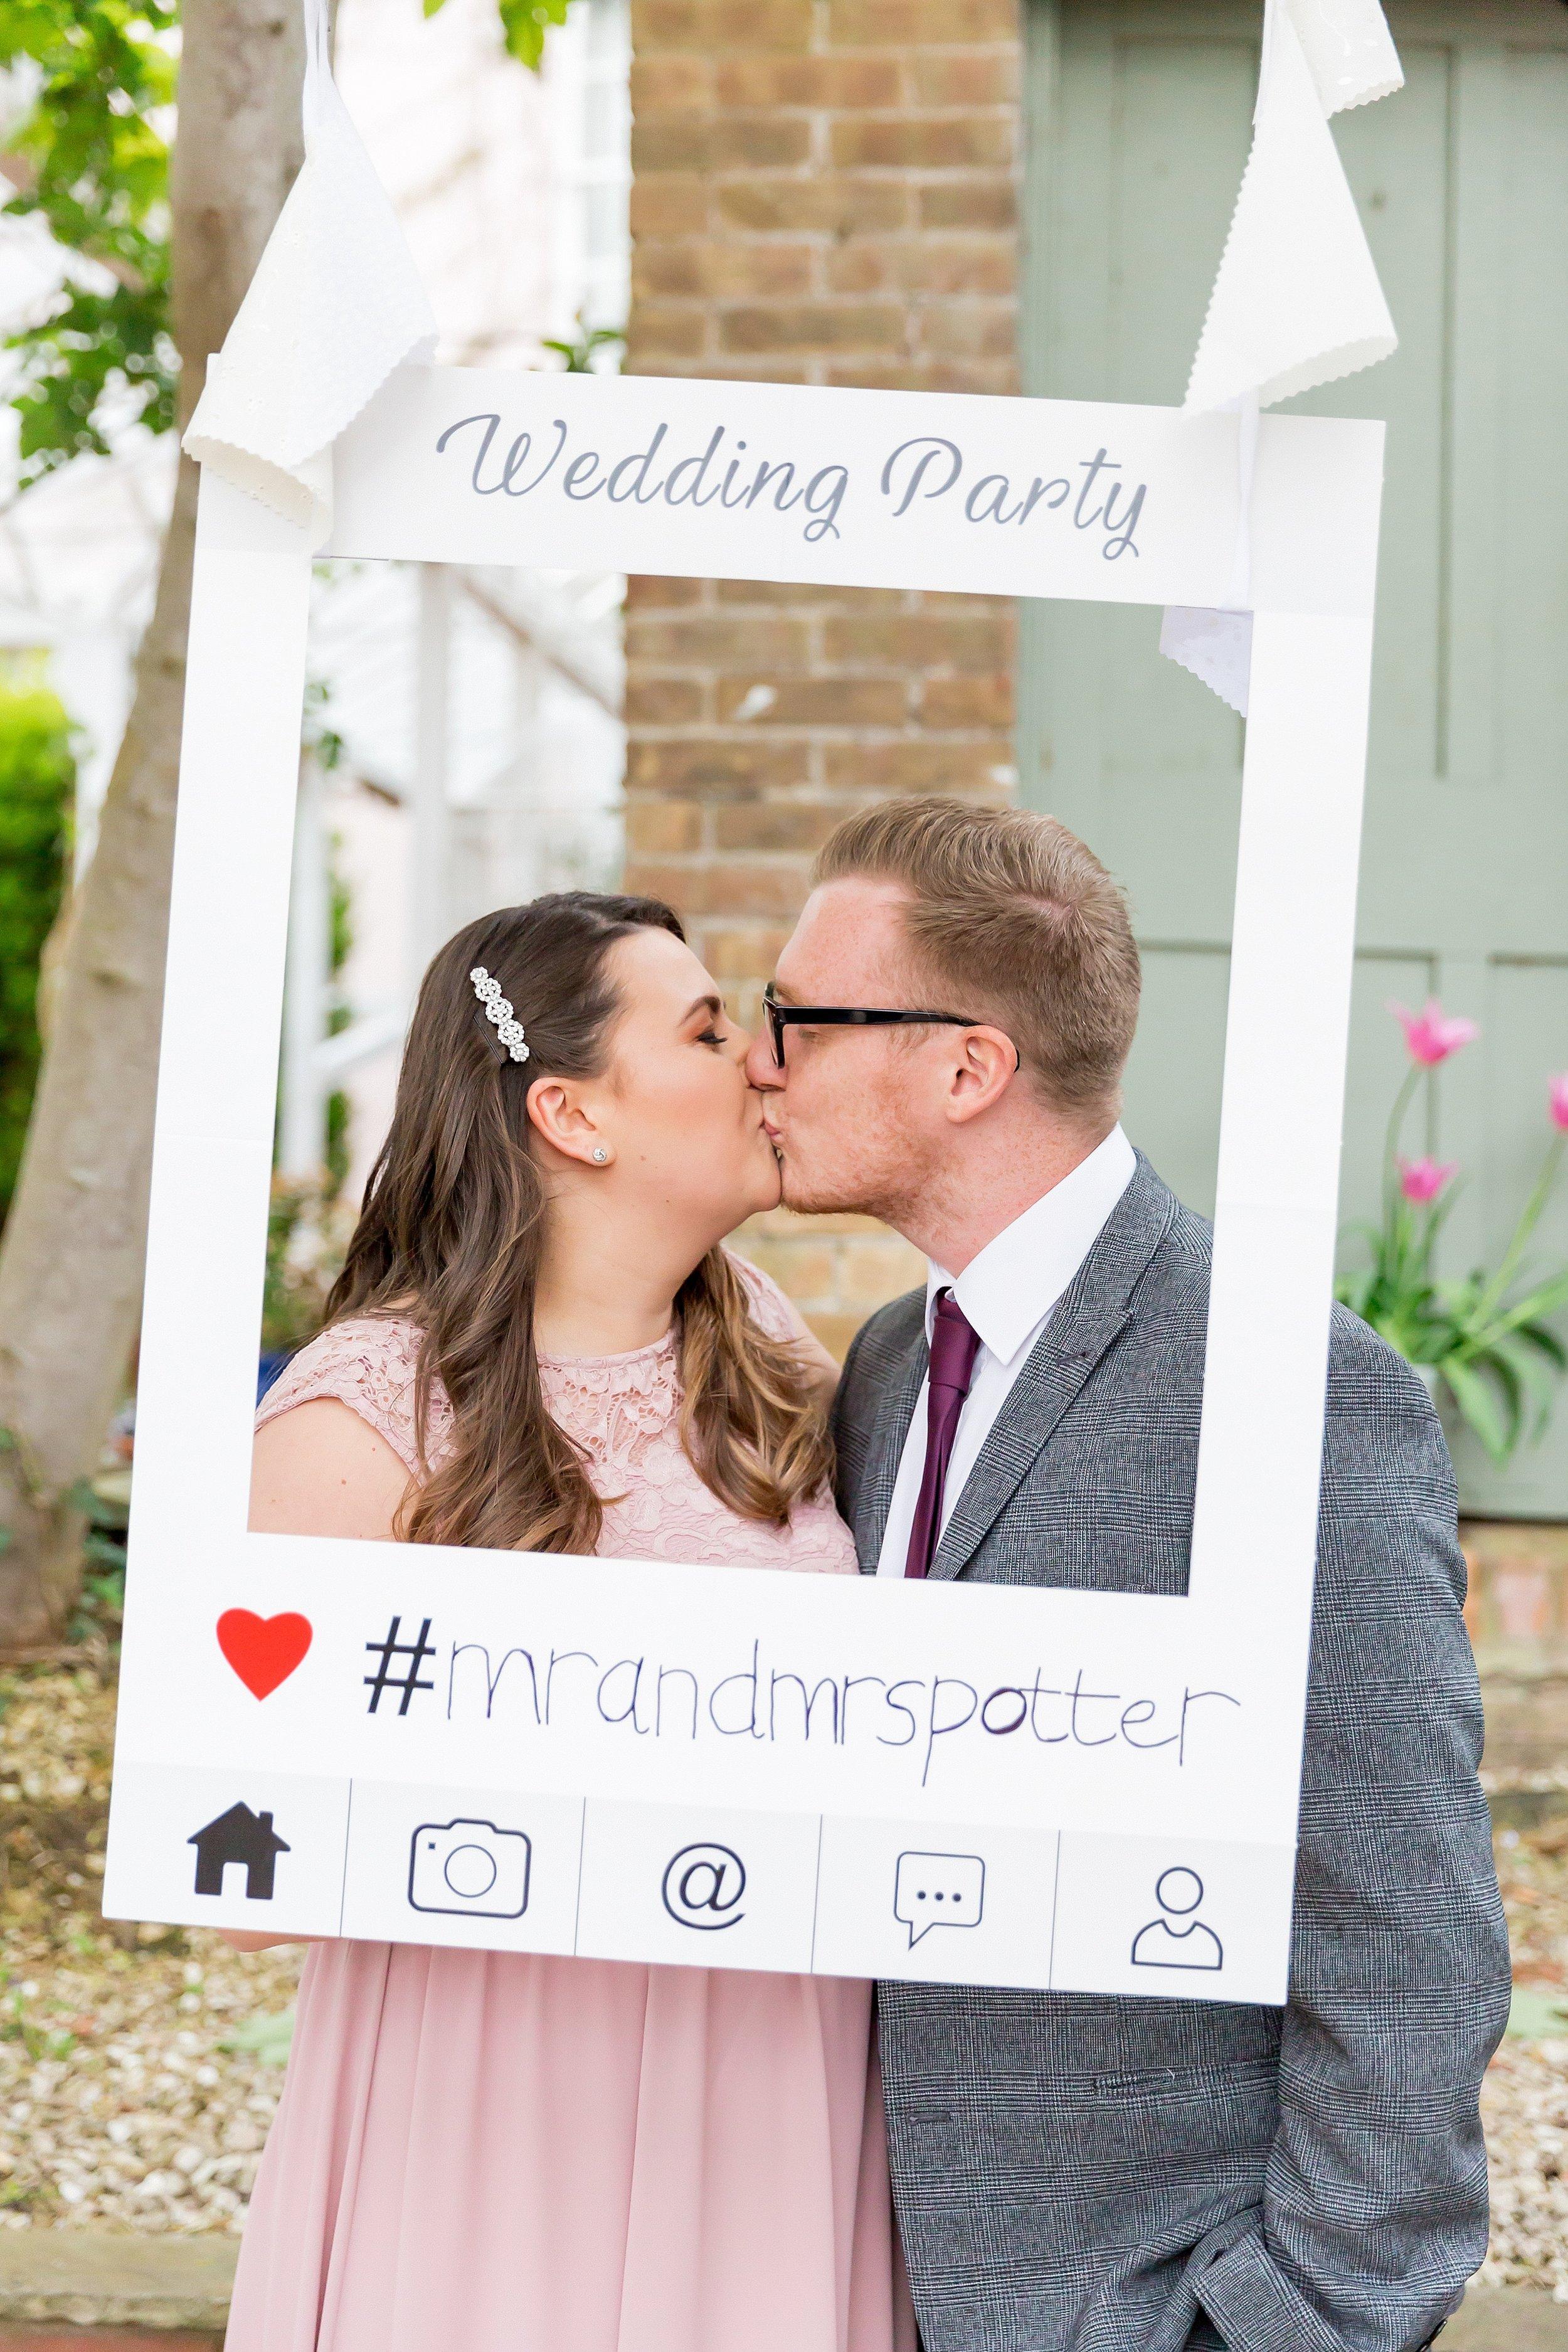 wedding props somerset.jpg